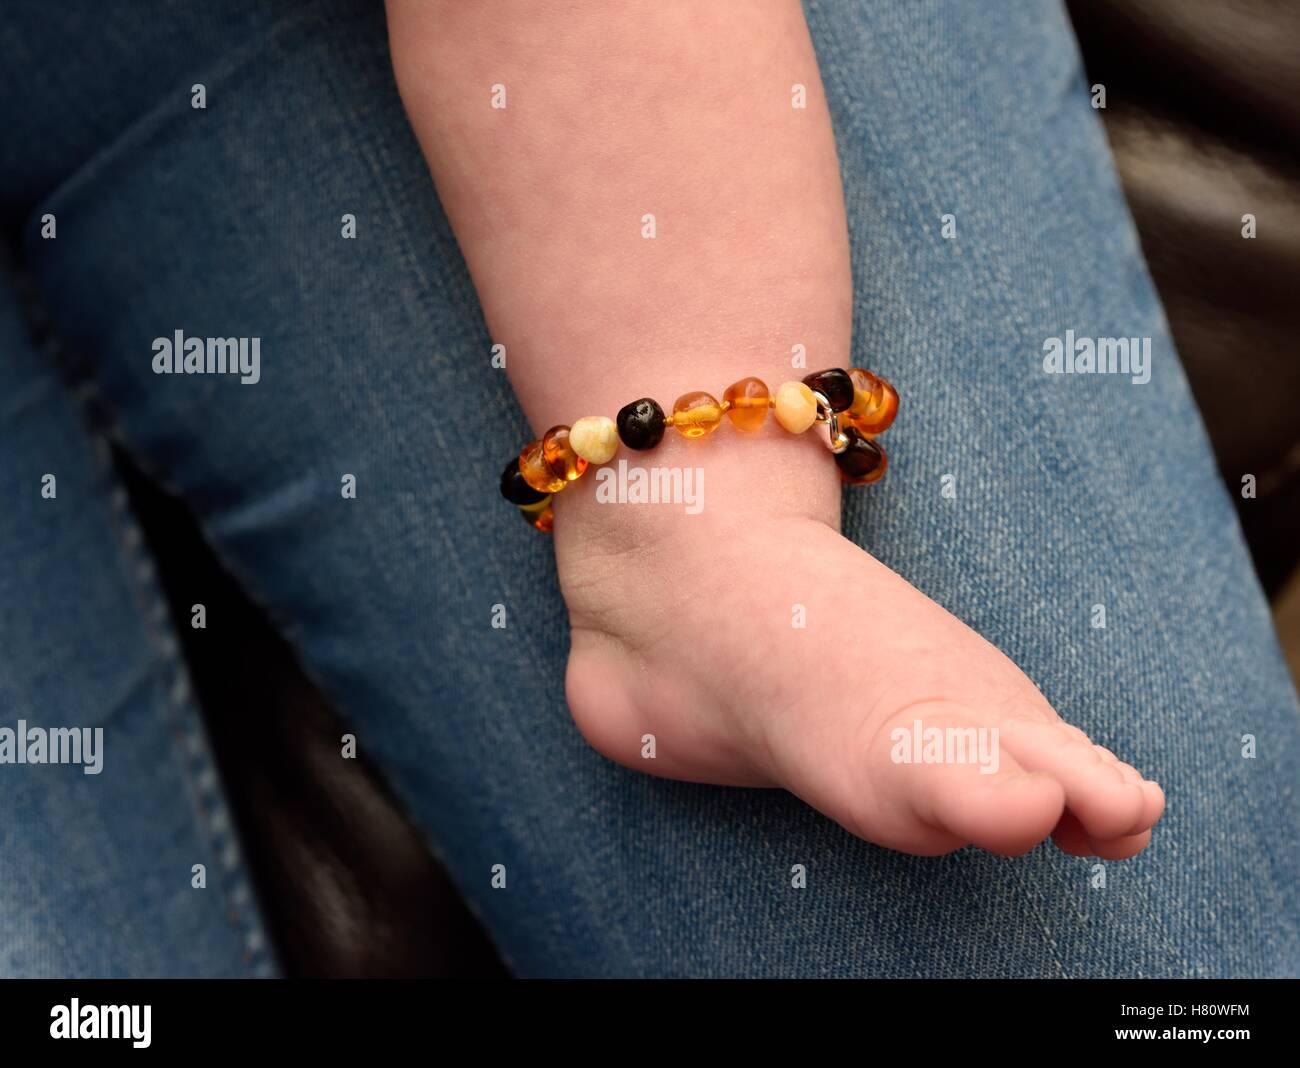 A babies teething beaded bracelet made of Amber stone - Stock Image